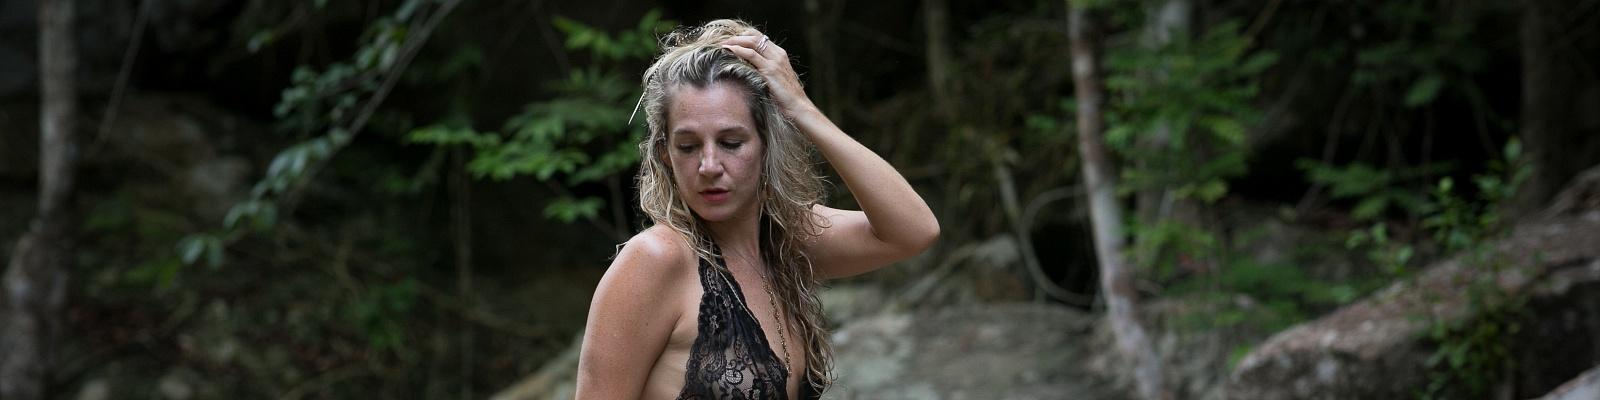 Stefanie's Cover Photo